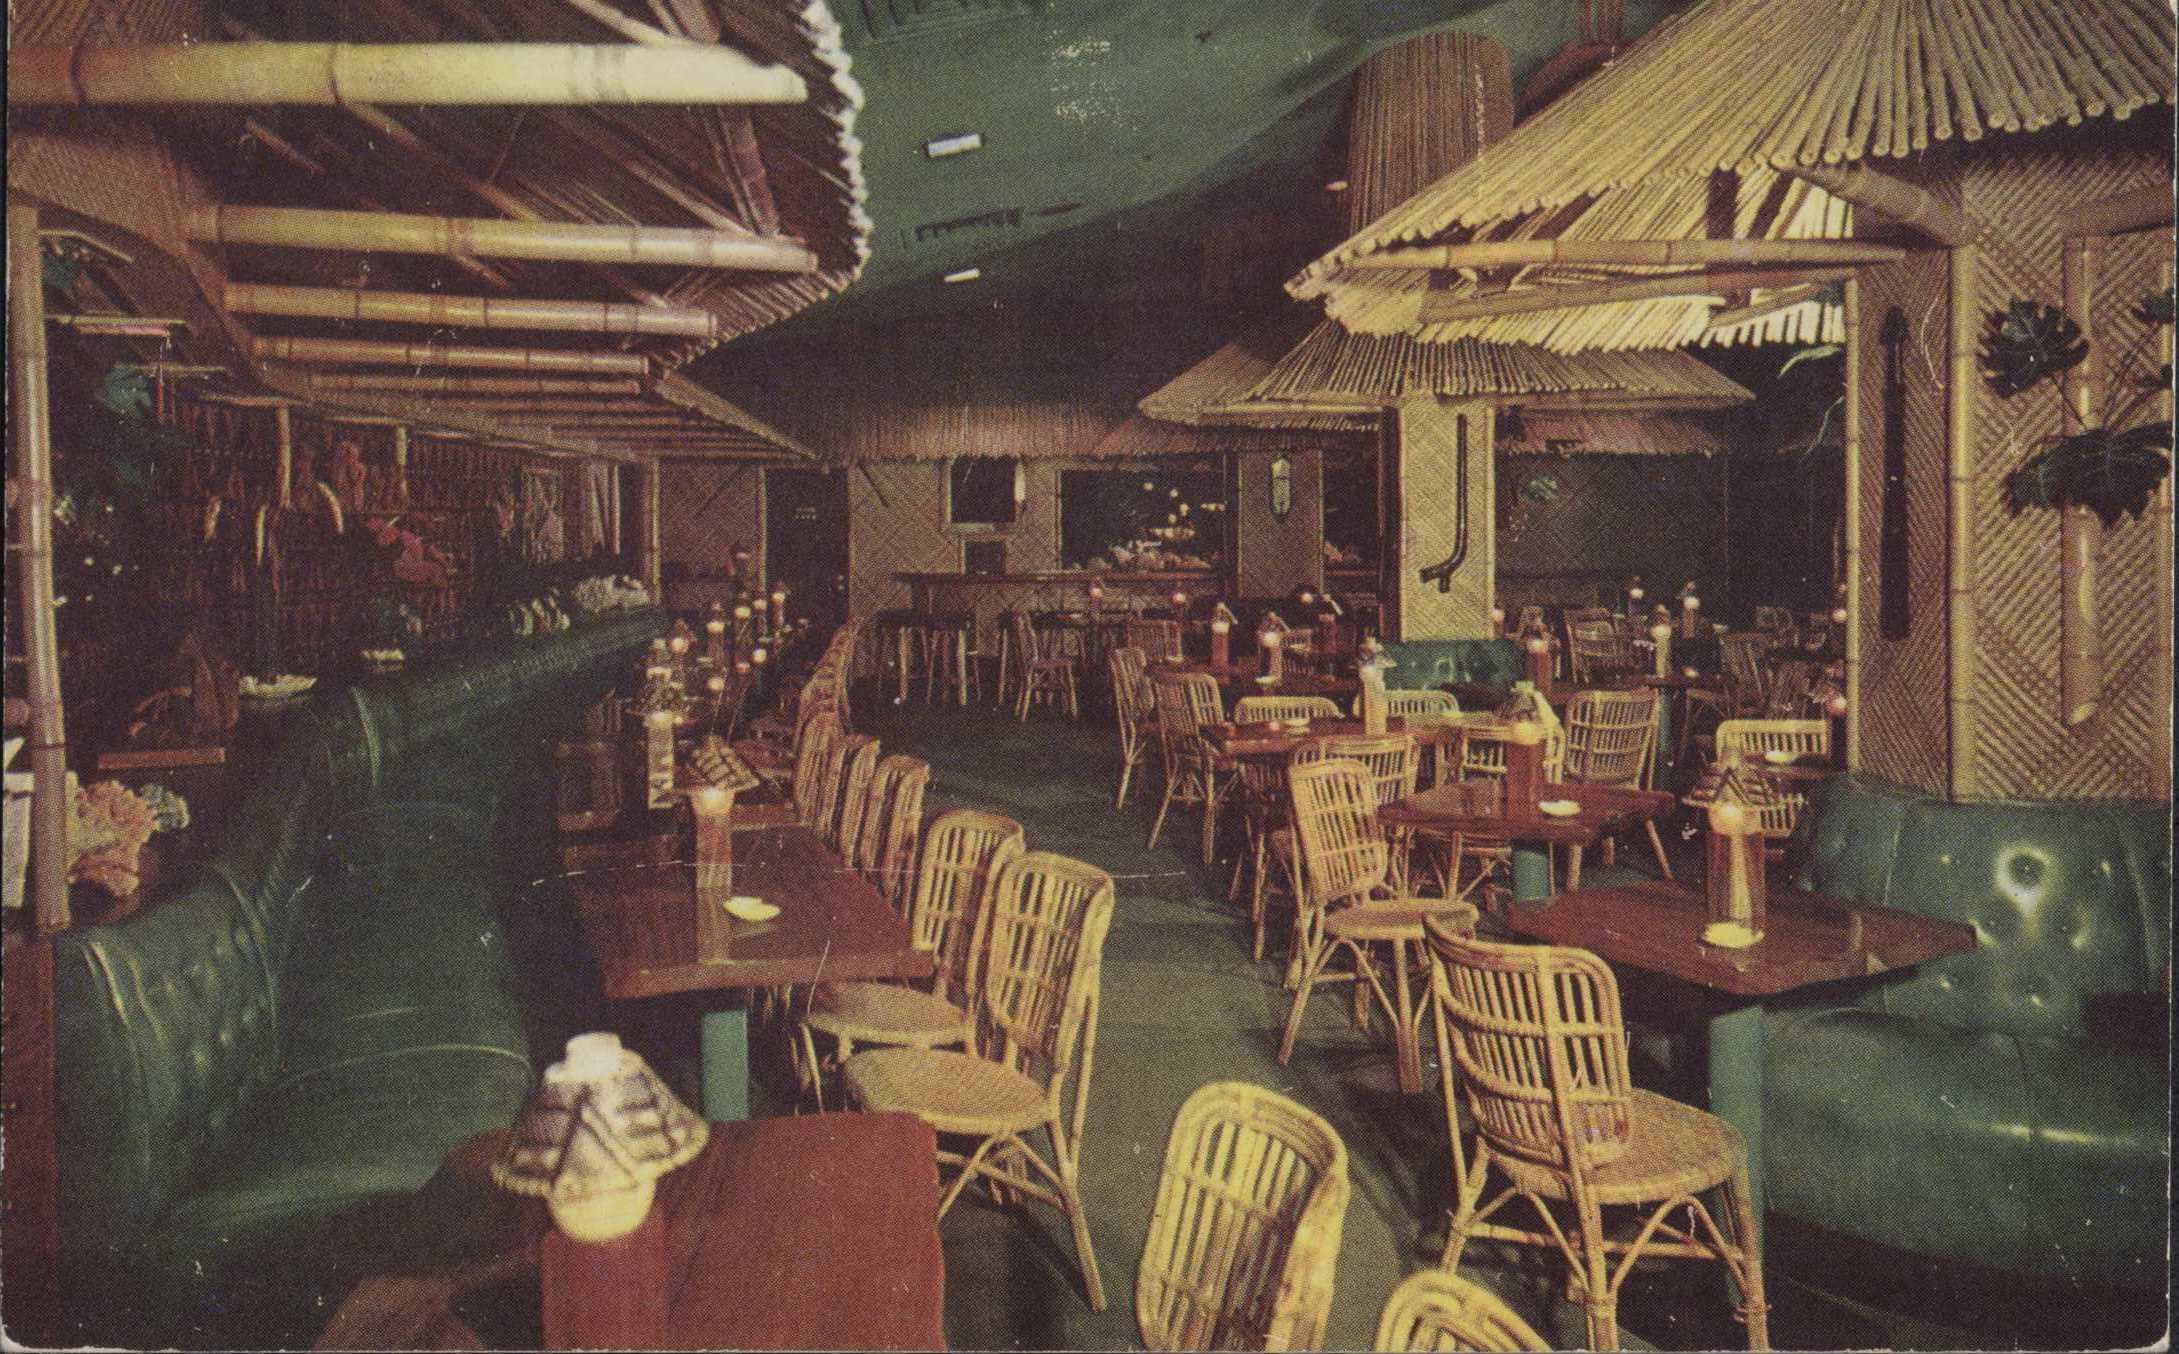 Hotel Nicollet Waikiki Room 1954 Postcard Side 1, hclib